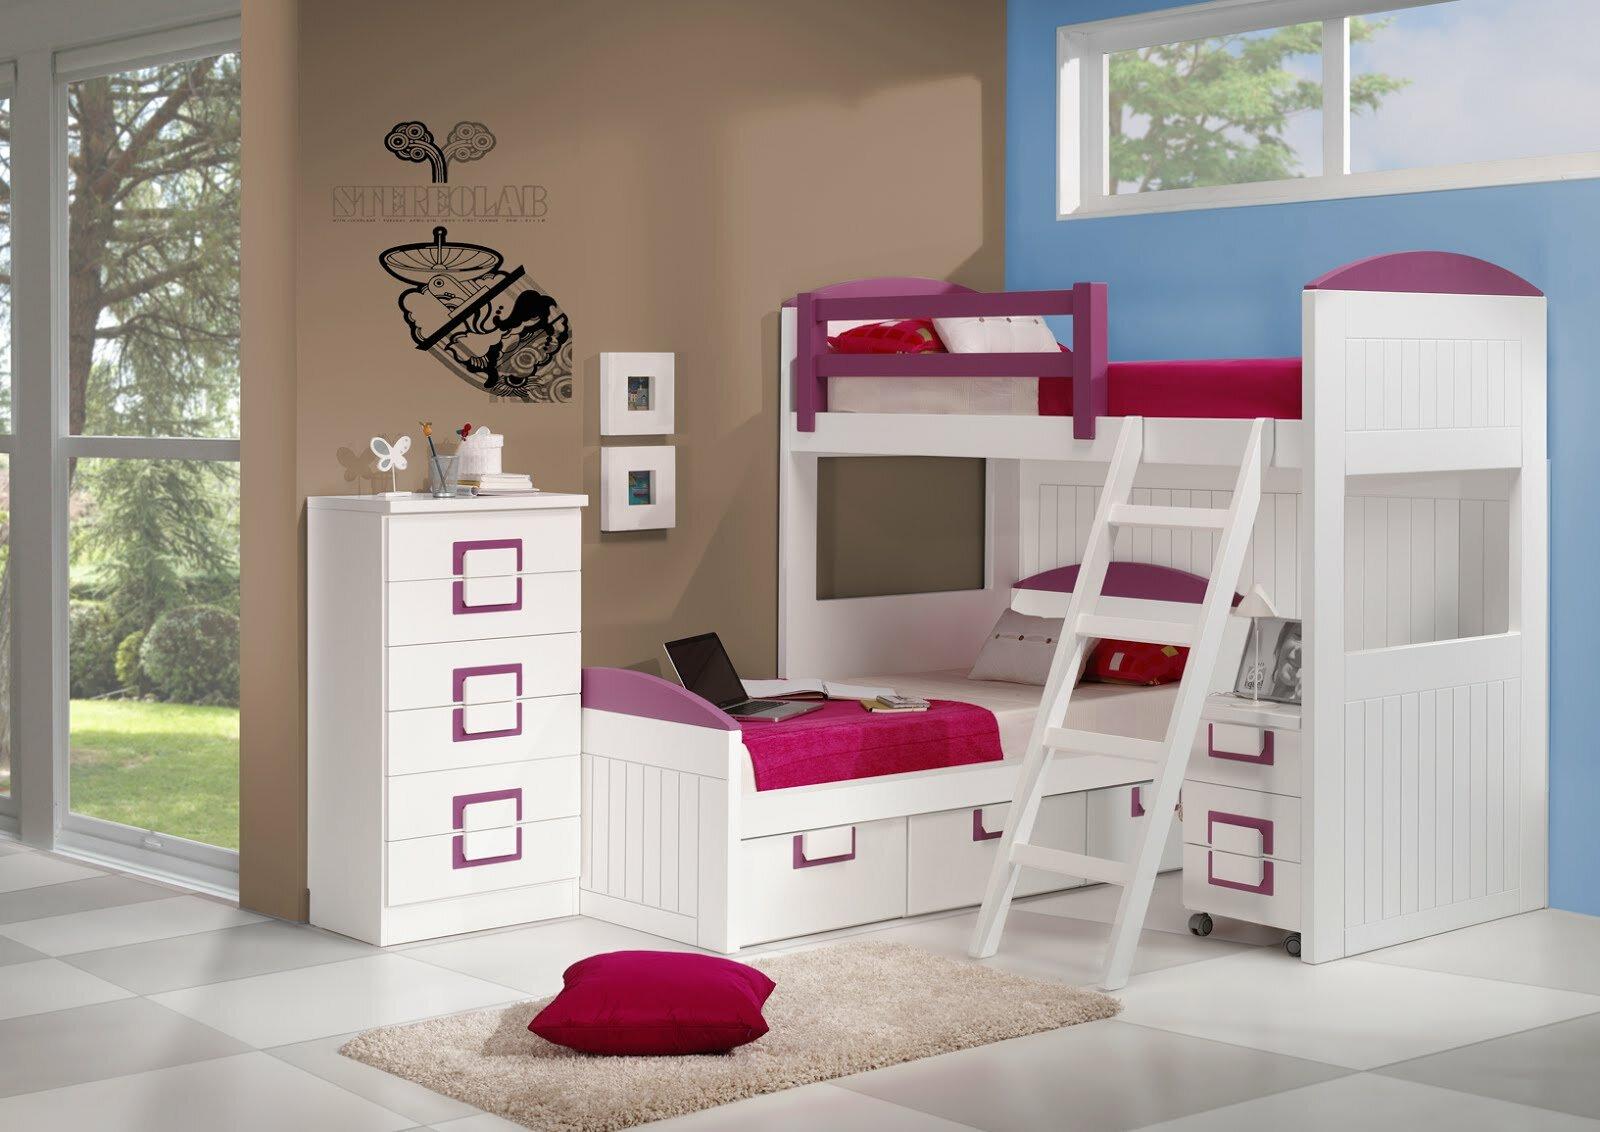 22 inspiring kids bedroom furniture designs - Habitaciones juveniles modernas ...